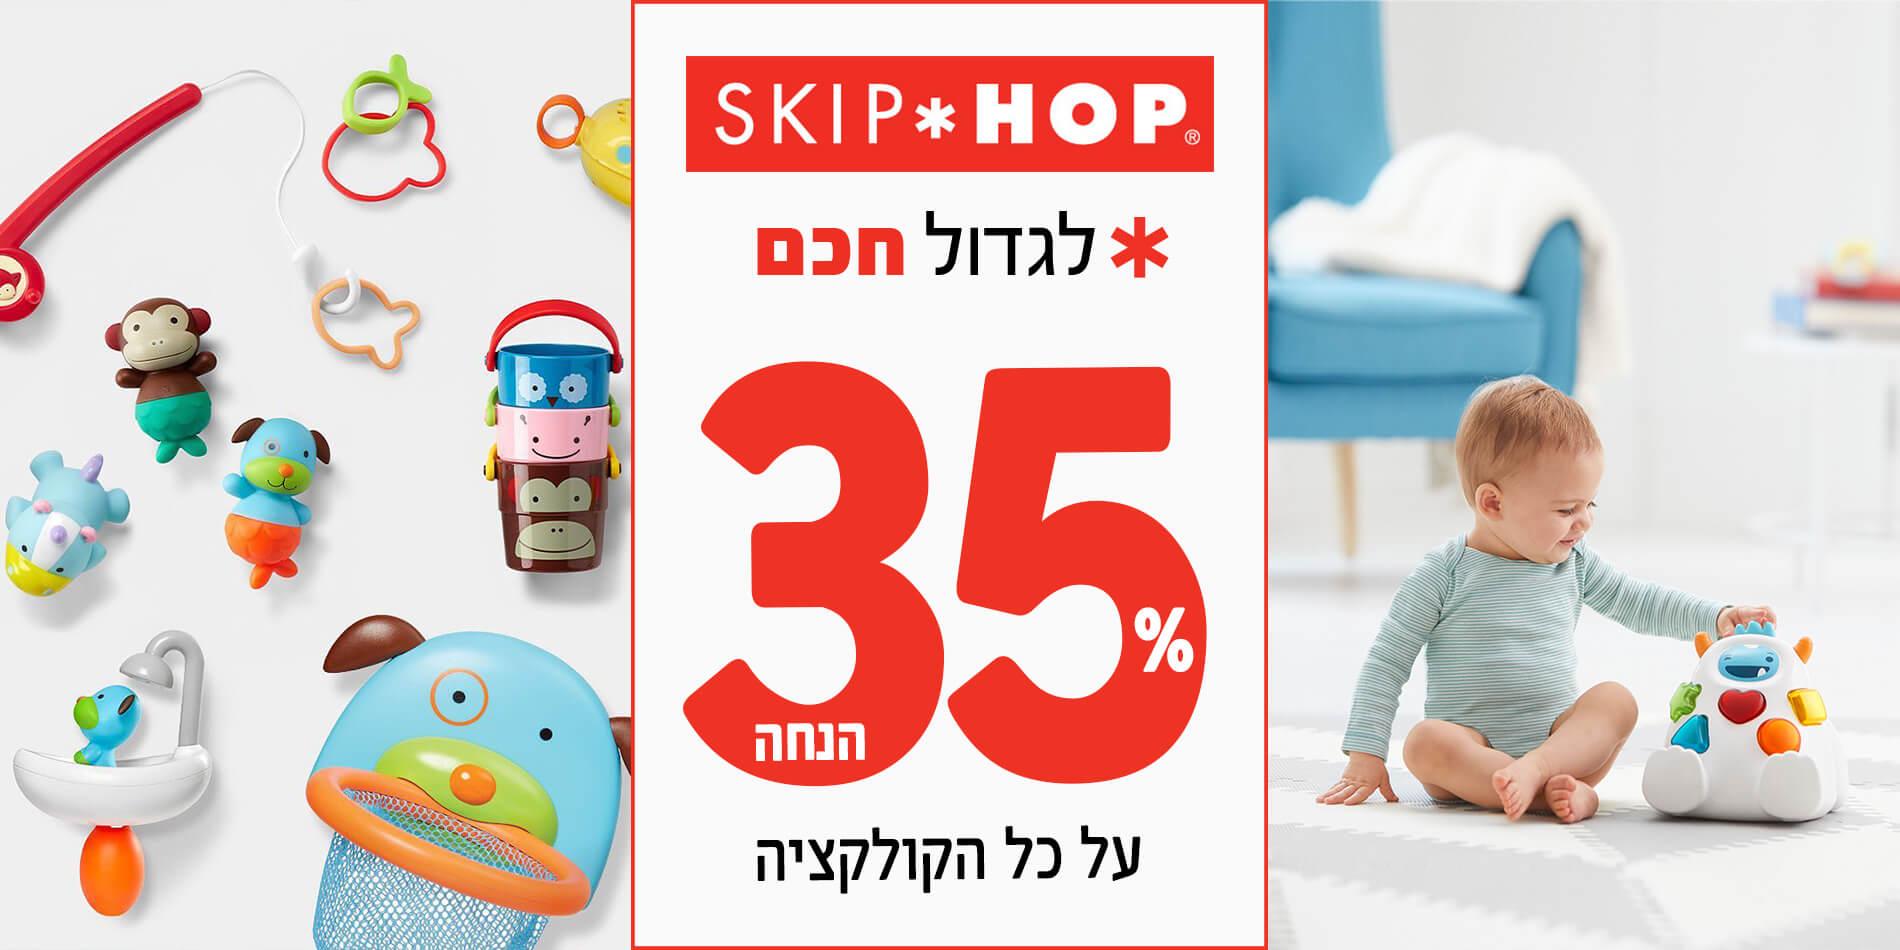 HP-banner_skip_hop-35